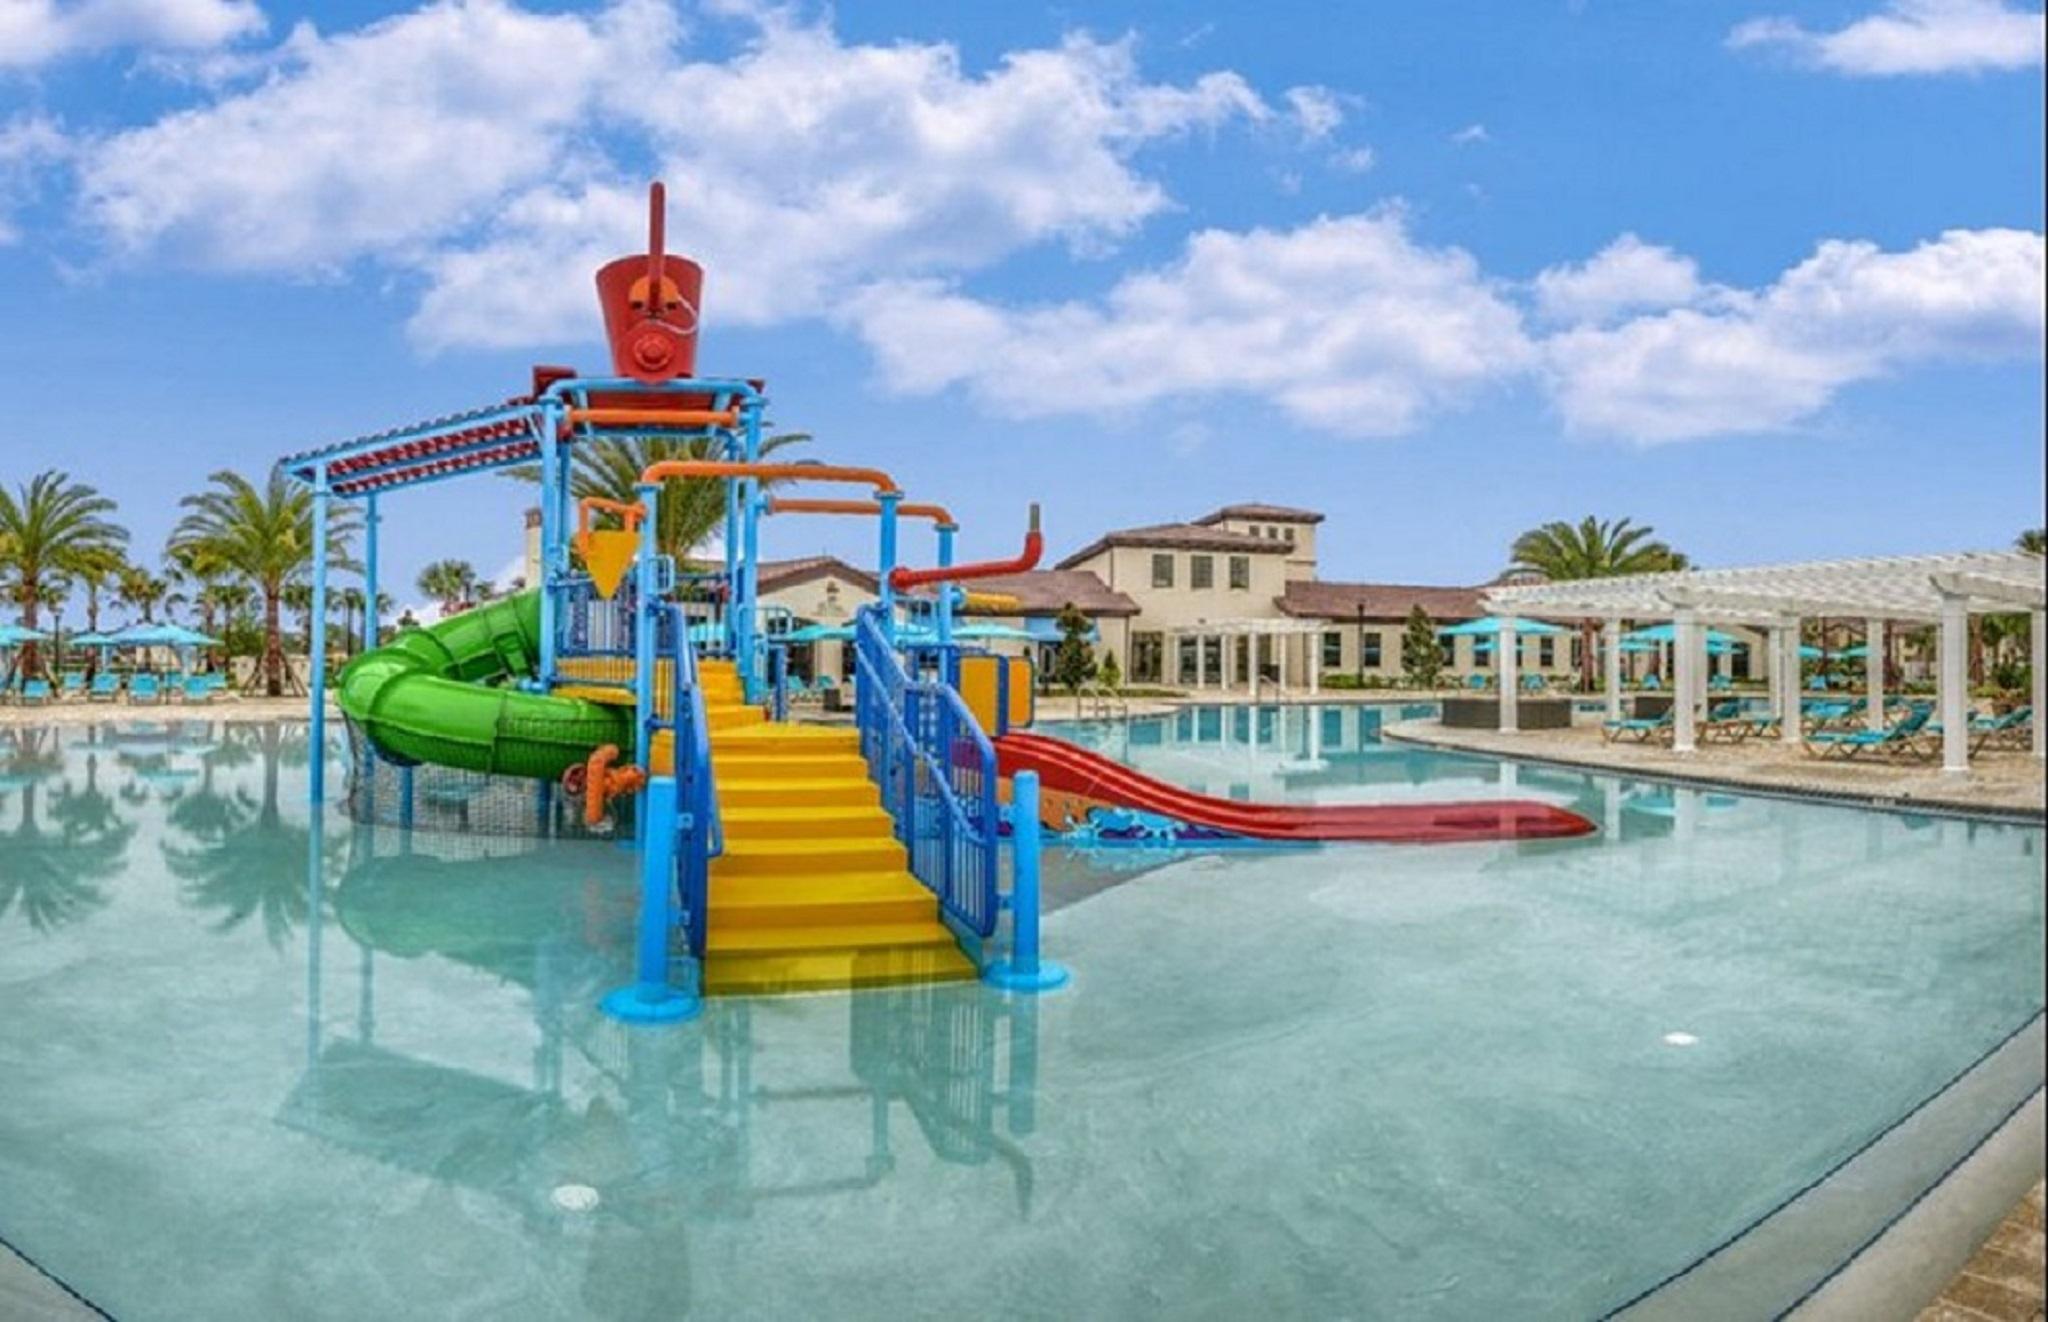 Apartment Villa  10 min from Disney  Golf  Wetpark all new photo 24721107